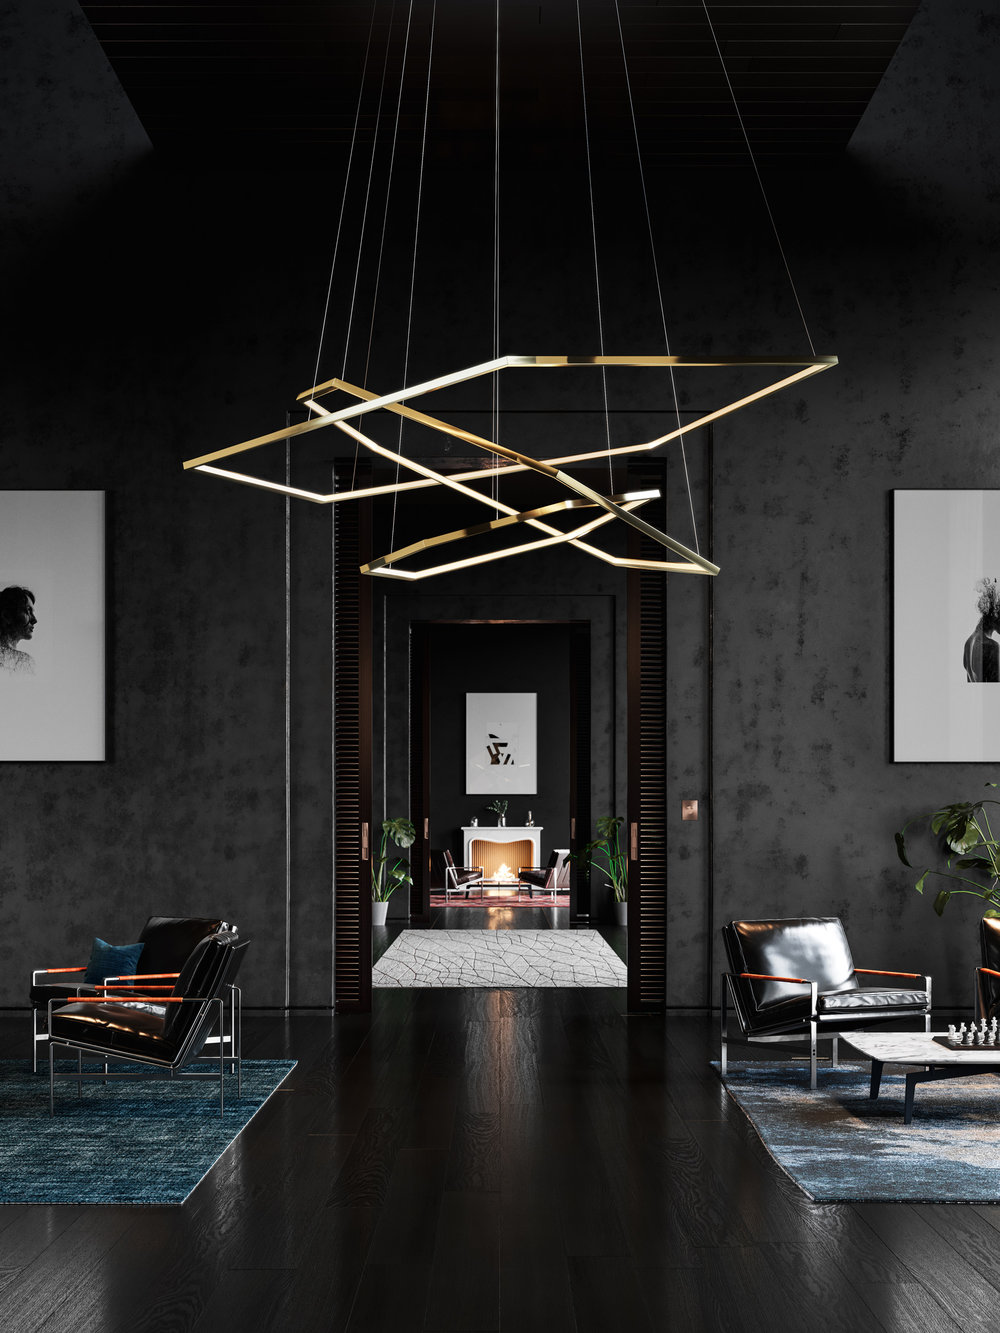 Recent_Spaces_Cameron_Design_House_Hex_01.jpg